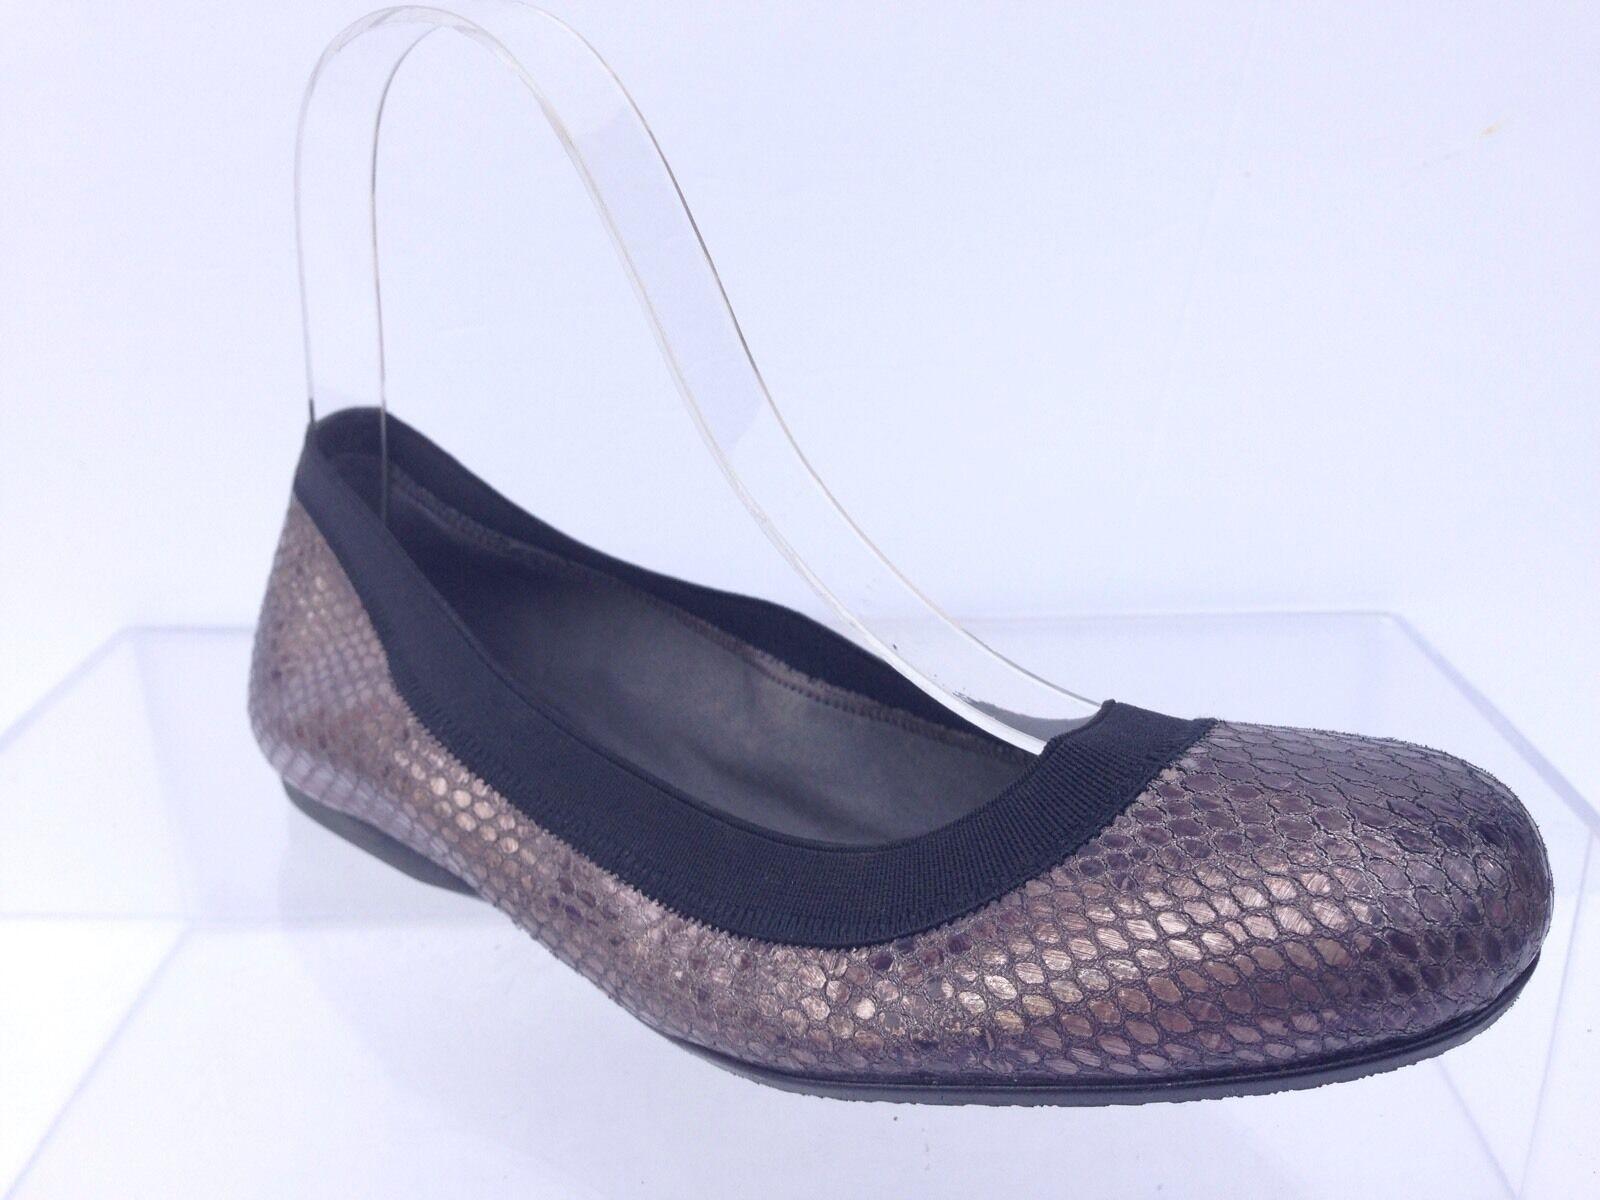 femmes Stuart Weitzman leather pewter snakeprint ballet flats  chaussures sz. 5.5